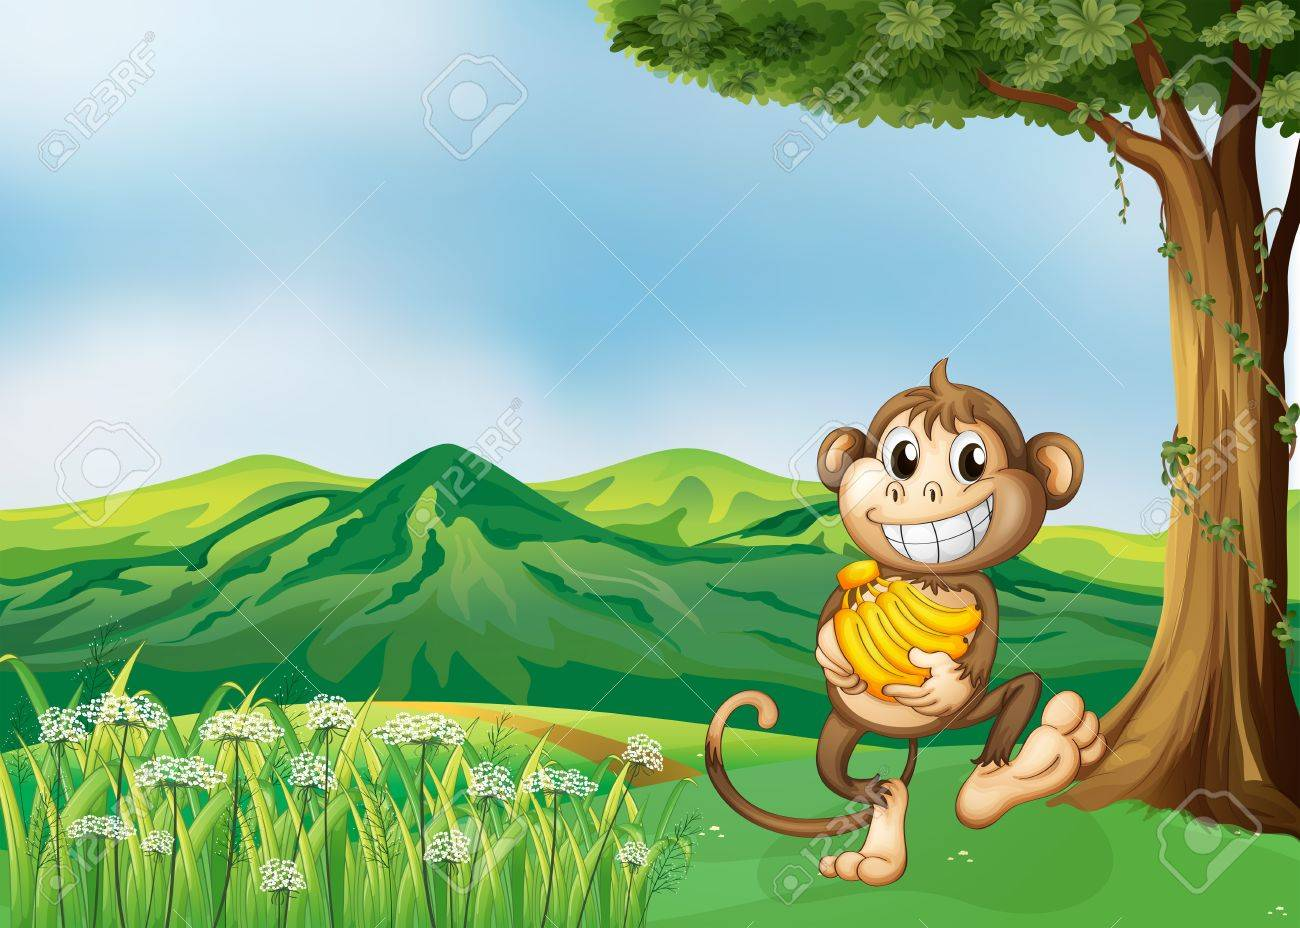 illustration of a monkey holding a banana royalty free cliparts